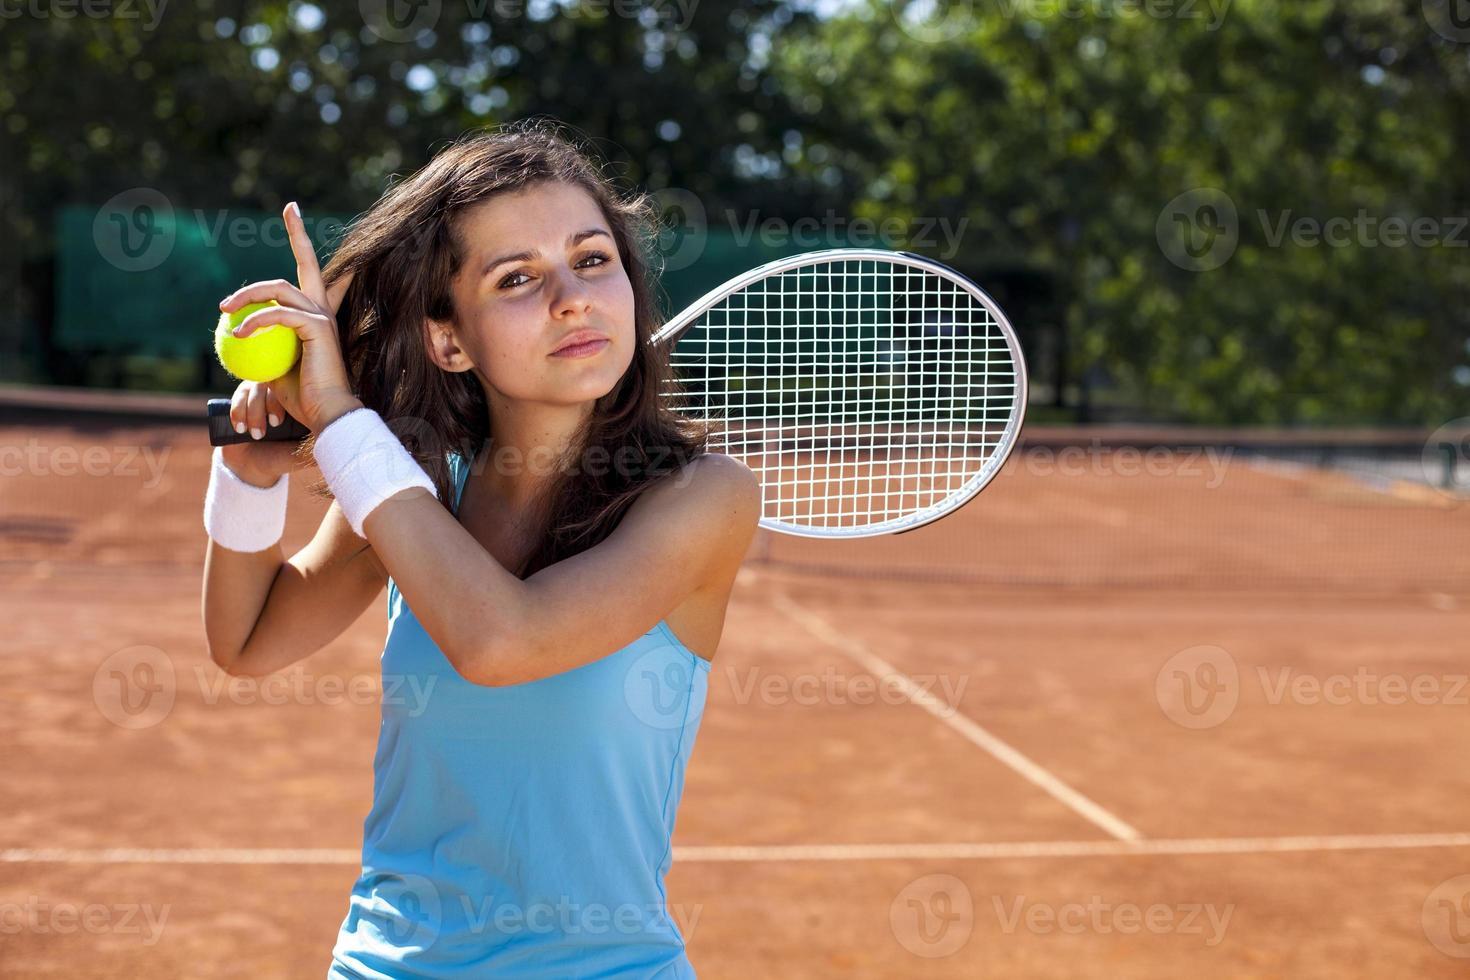 jong meisje met tennisbal op de rechter foto